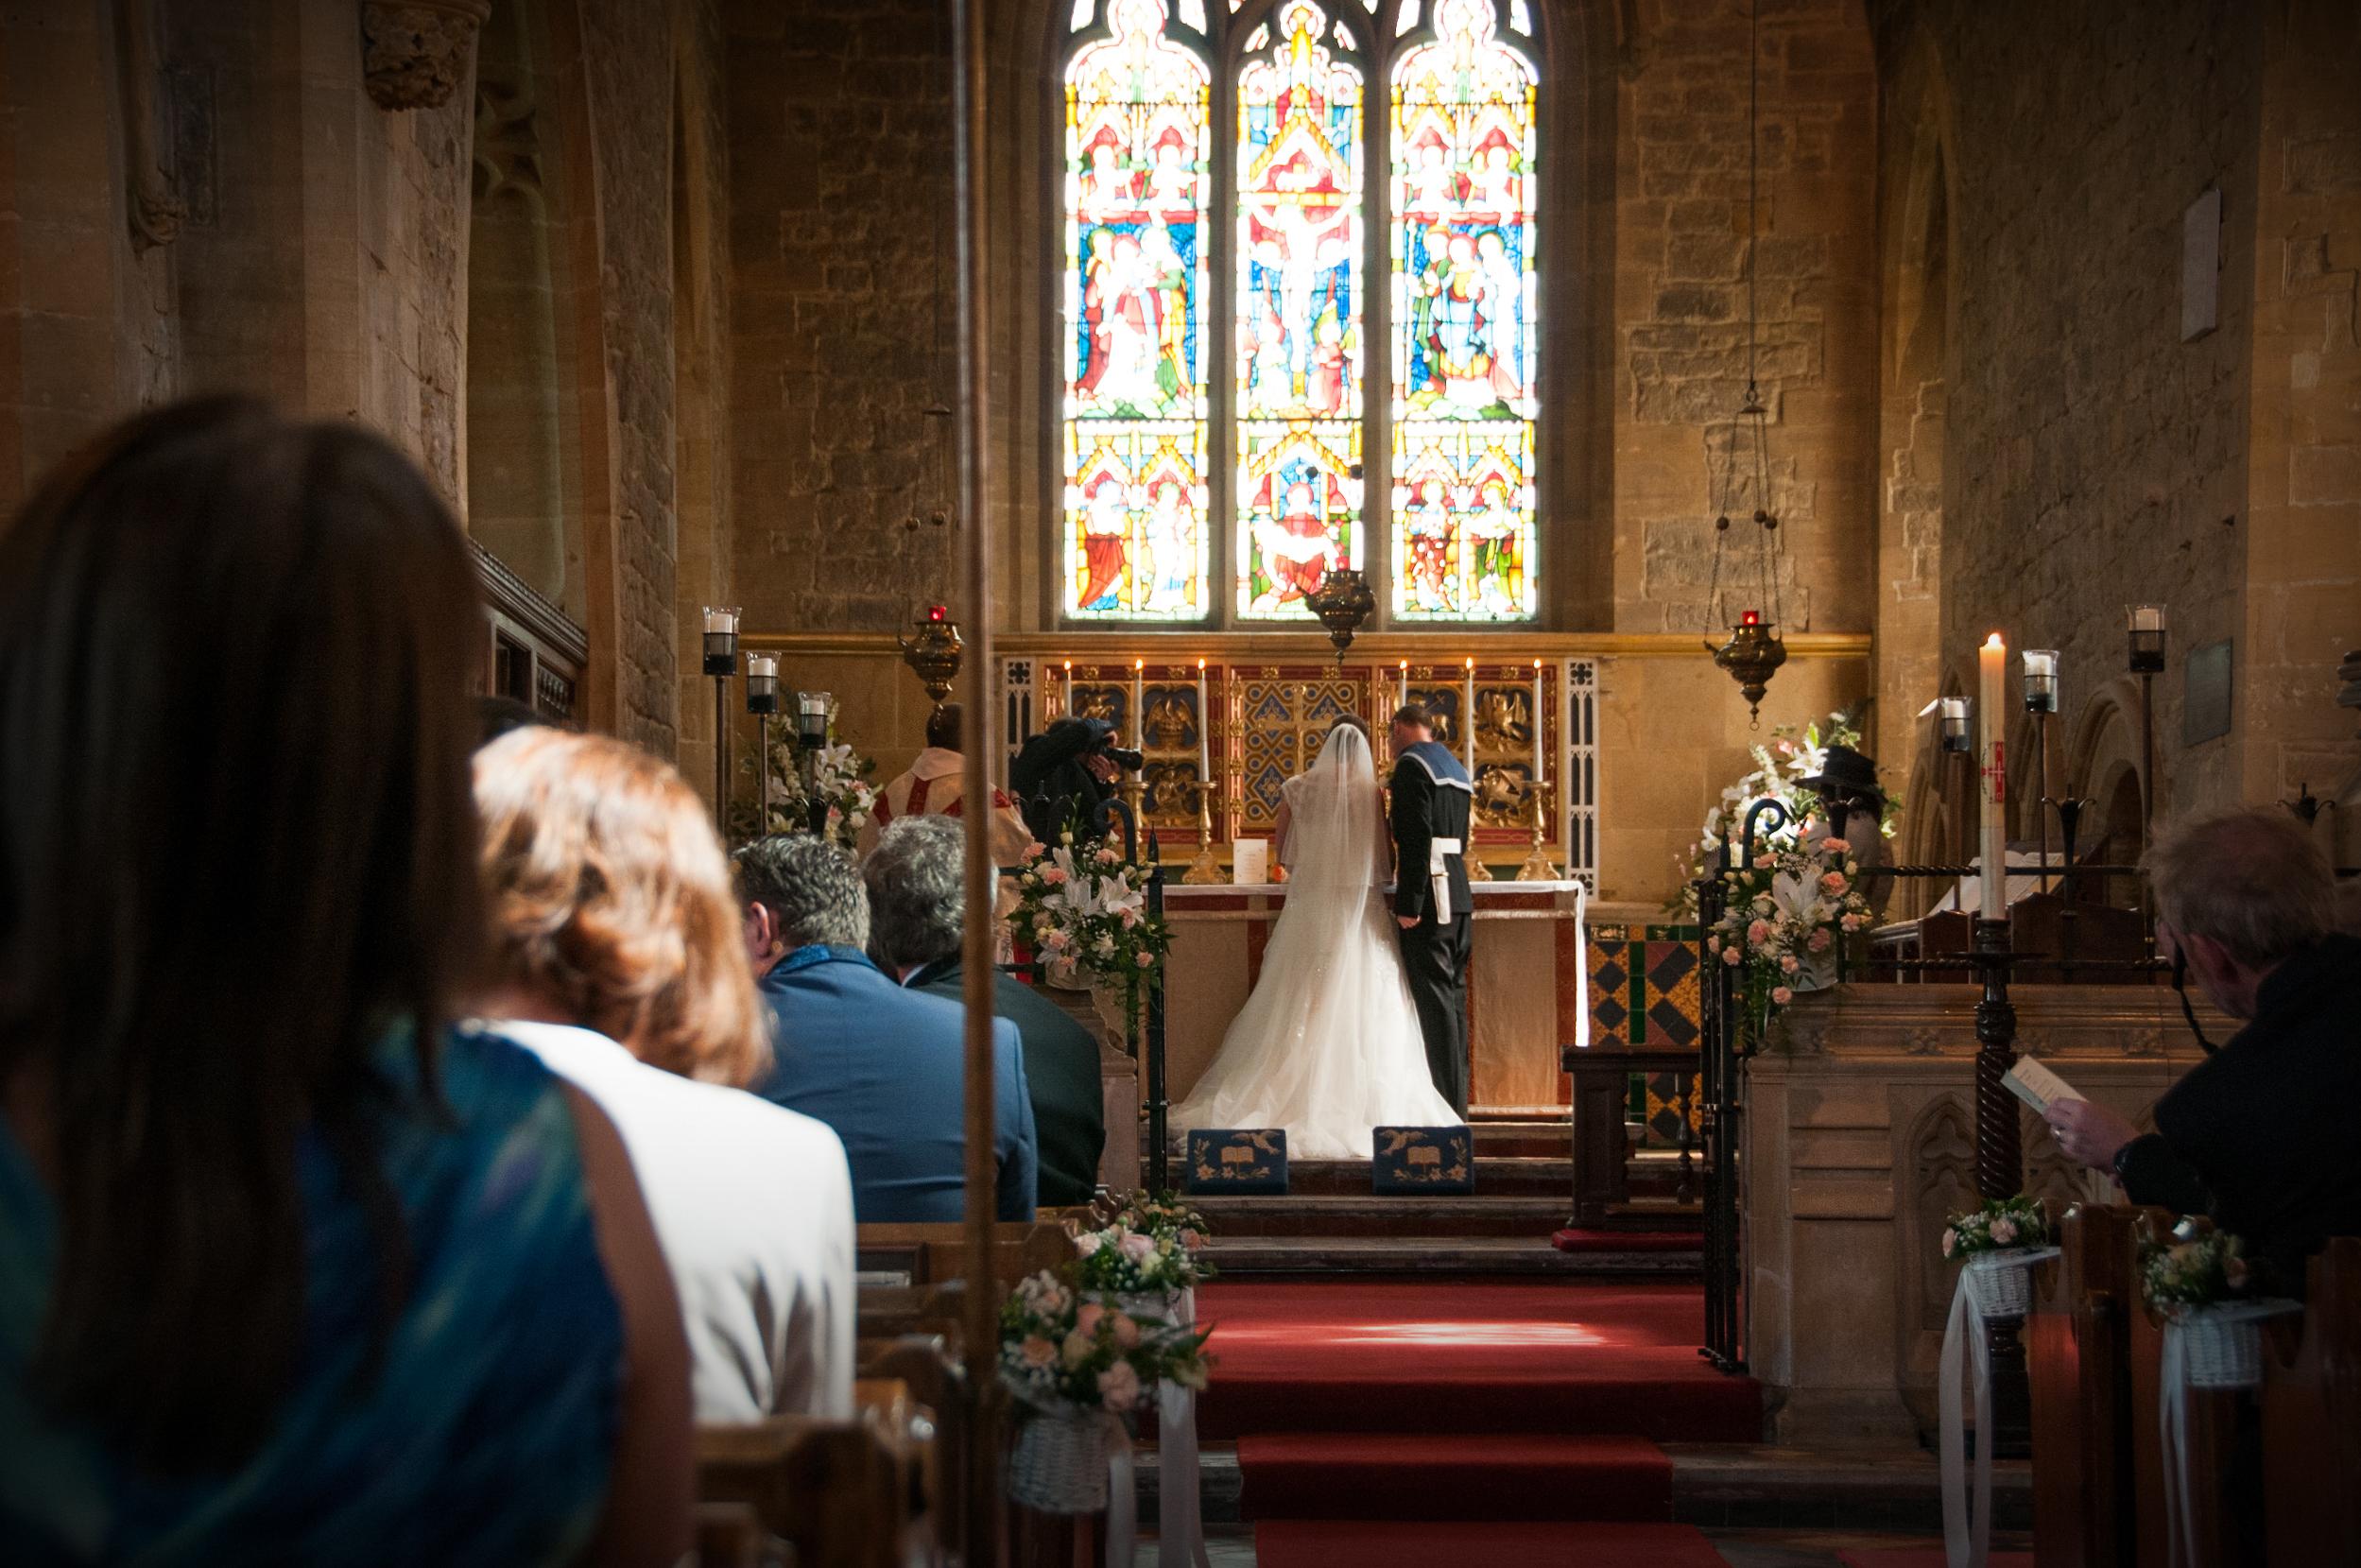 wedding(23.04.16) (65 of 41).jpg